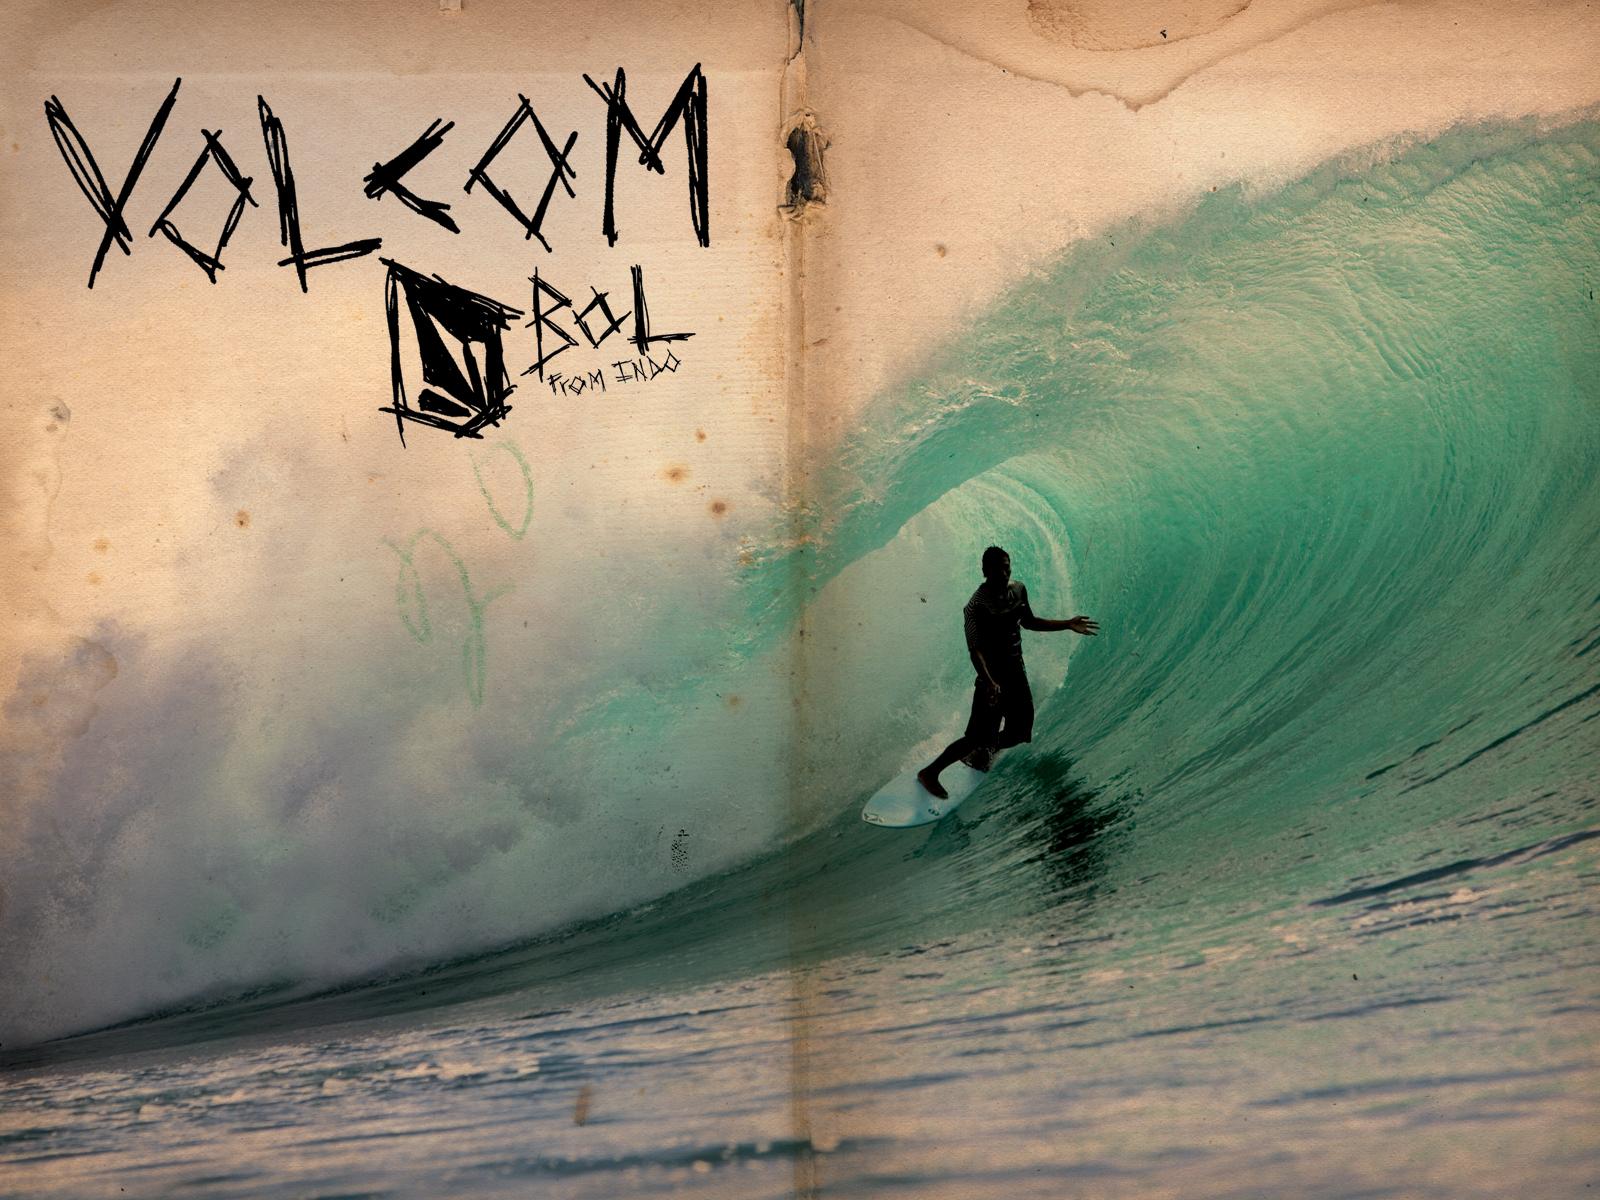 Wallpaper Volcom Stone | New hd wallon